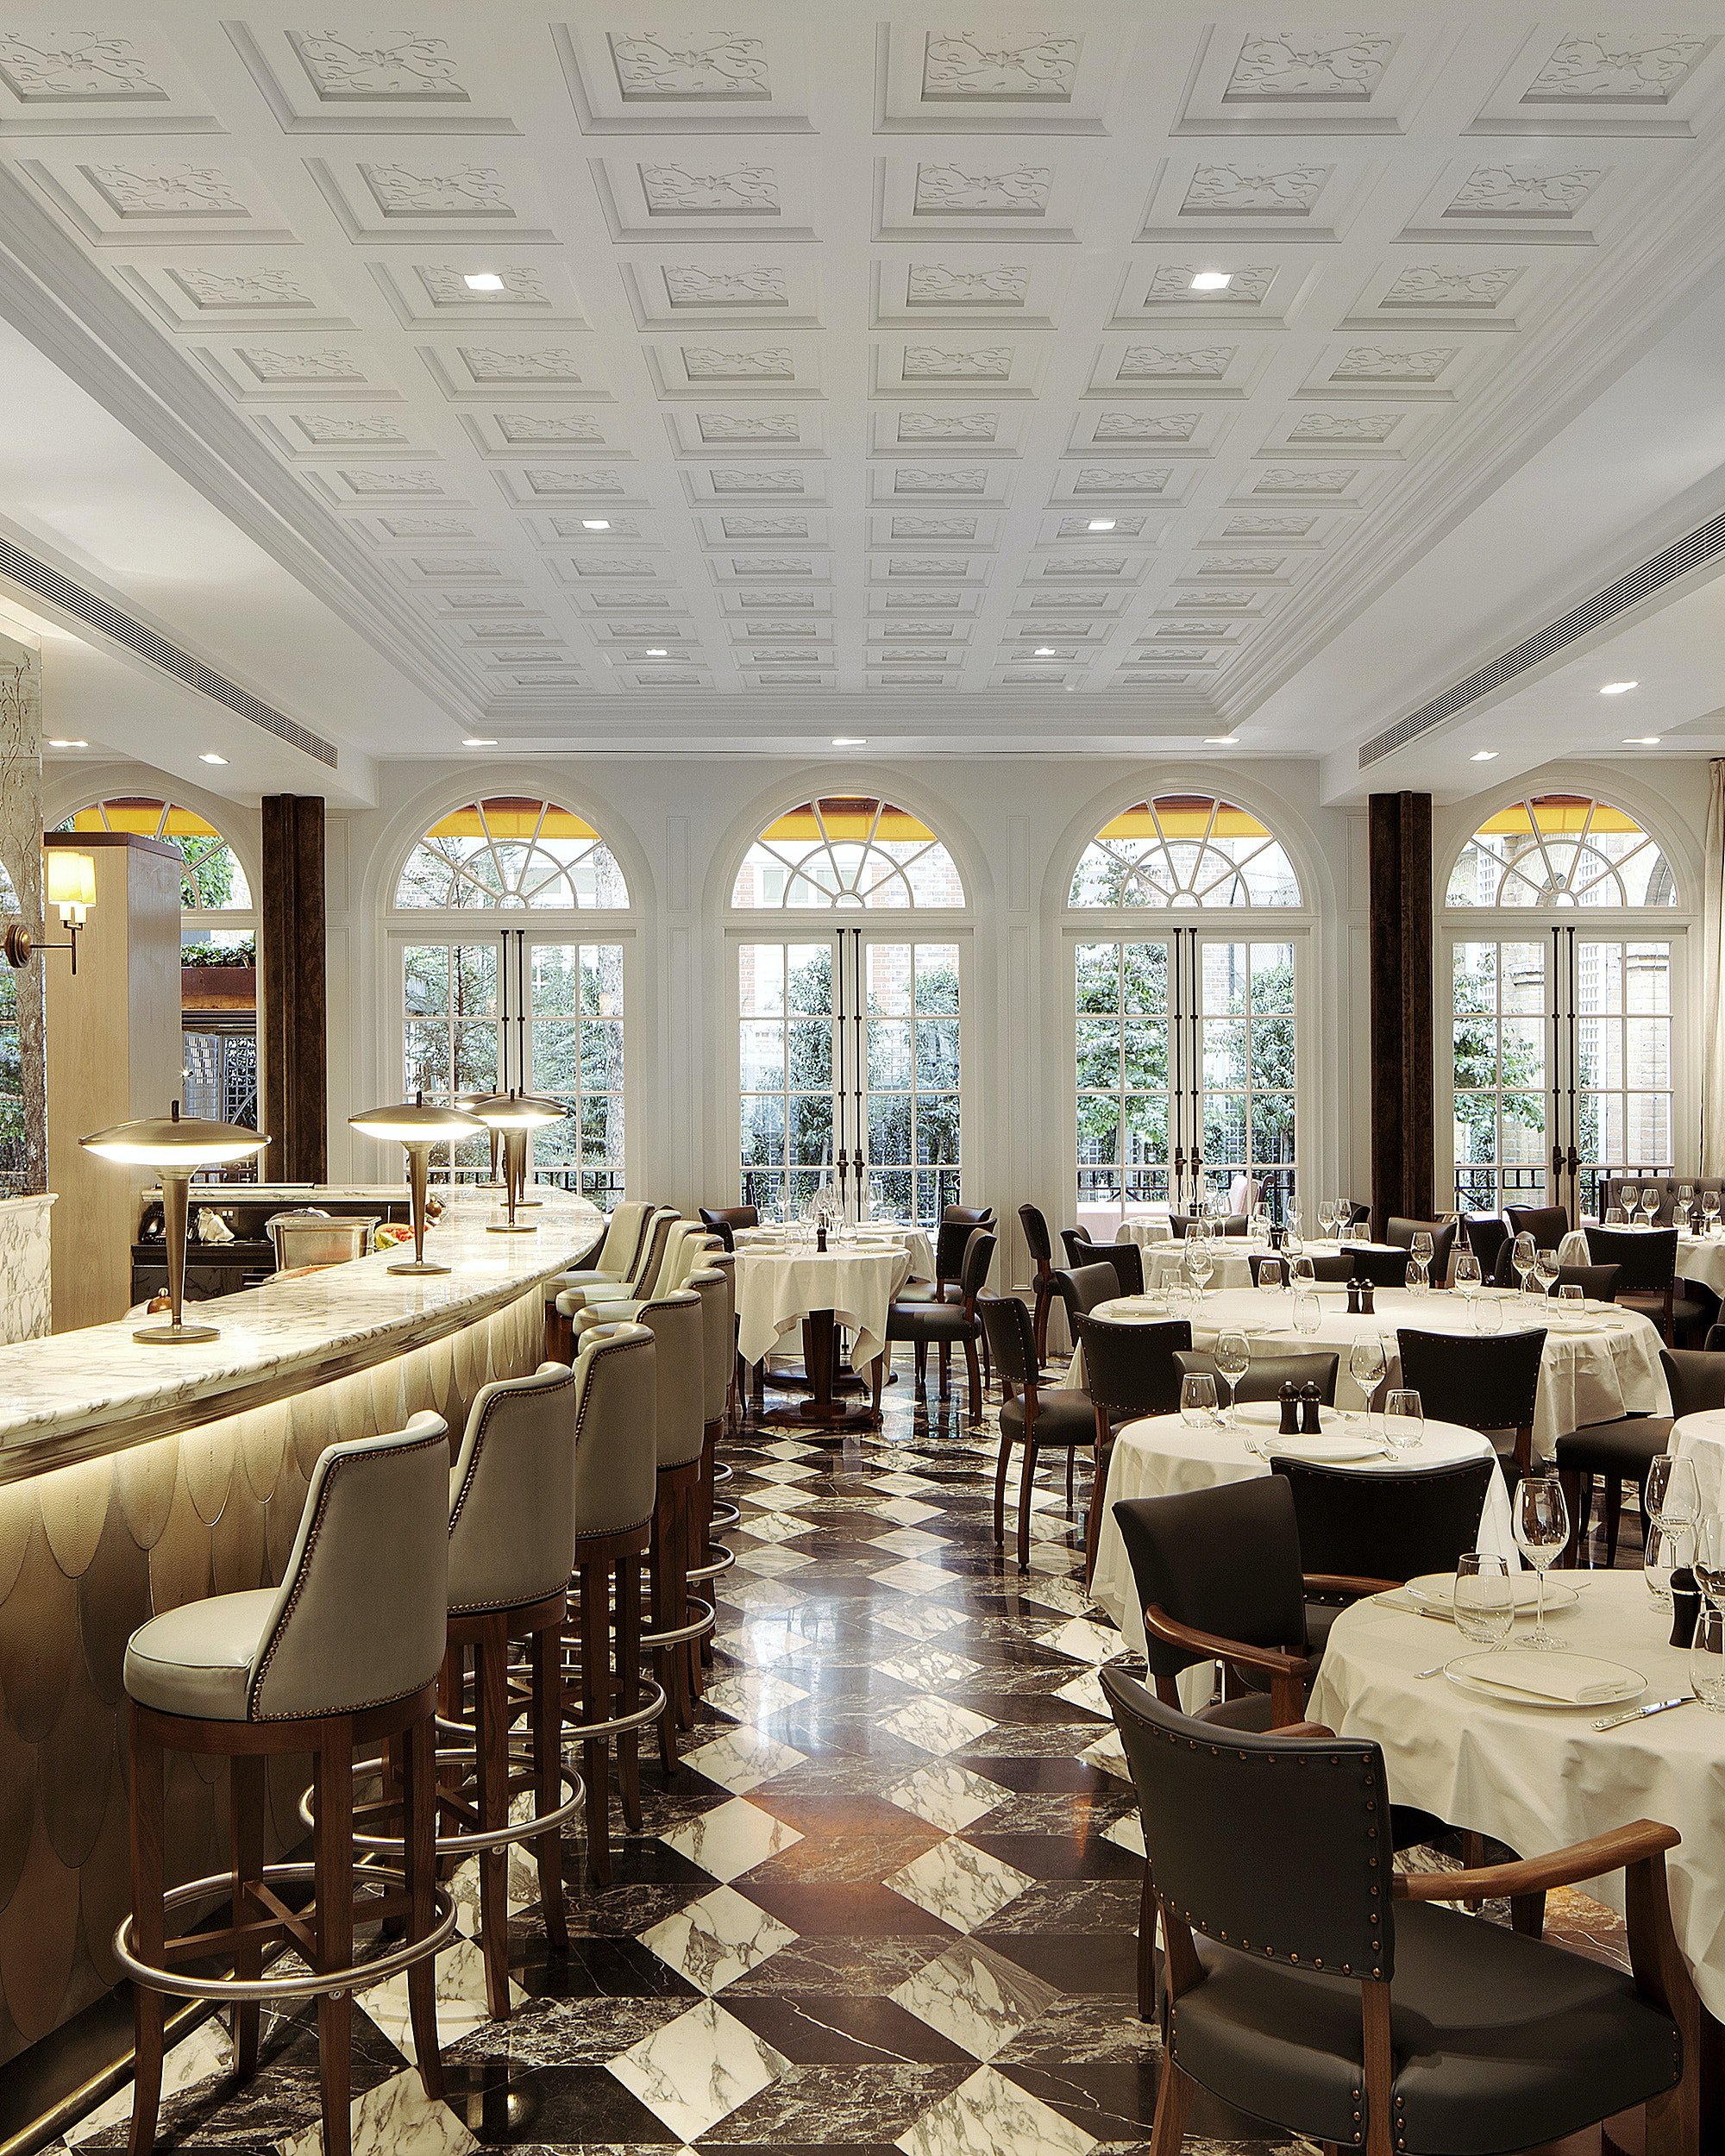 arts-club-london-architecture-dining